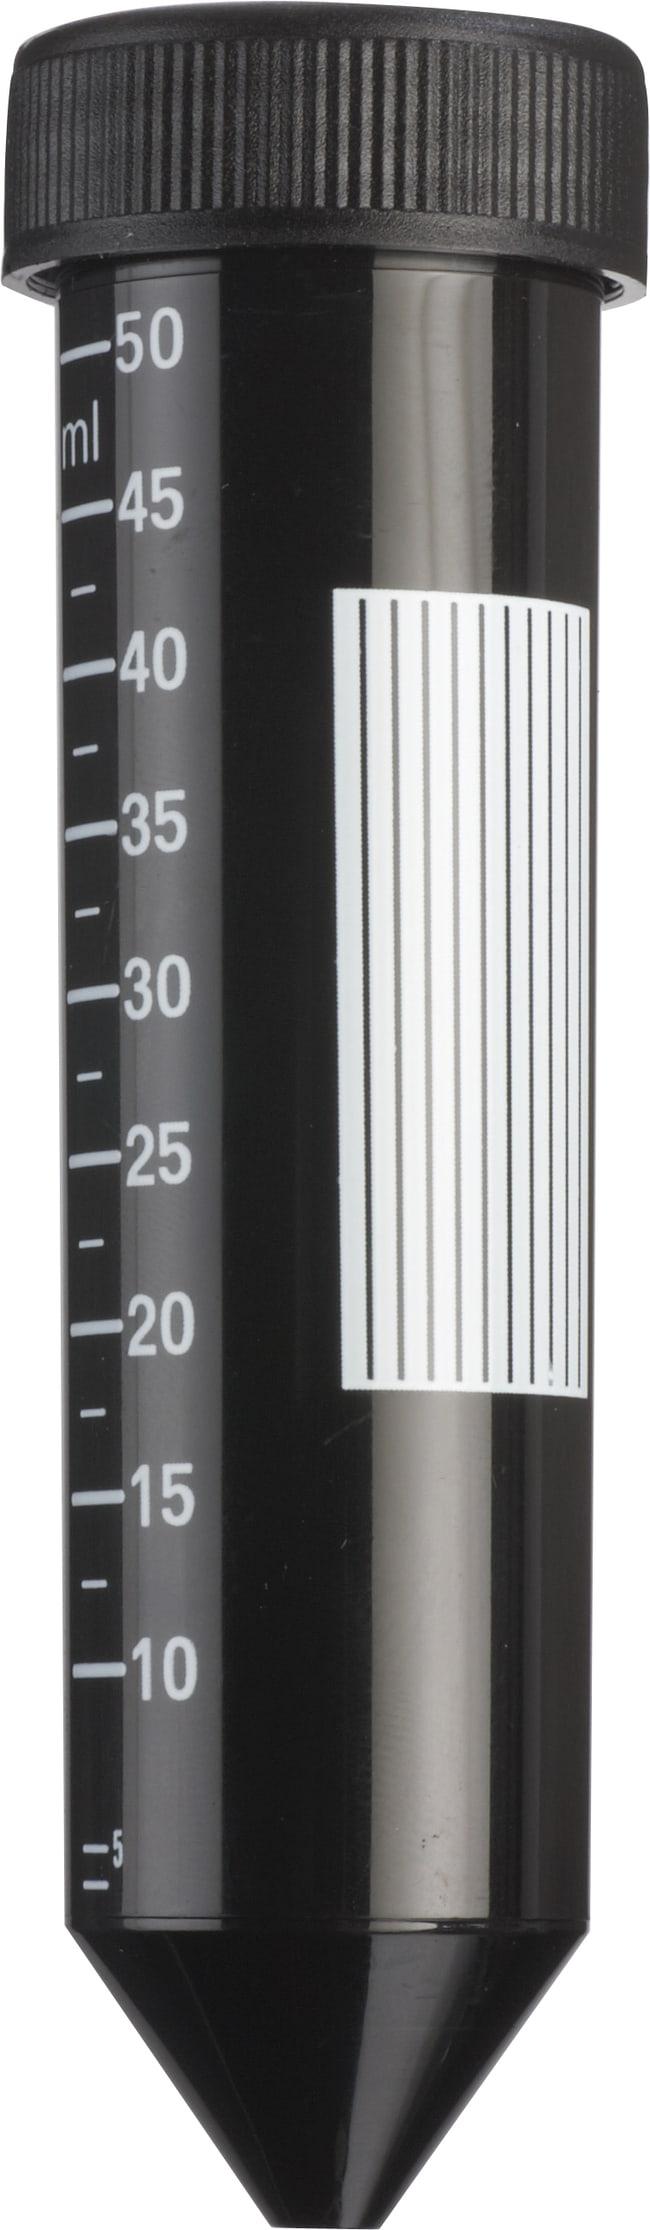 Heathrow ScientificConical Tube:Tubes:Centrifuge Tubes